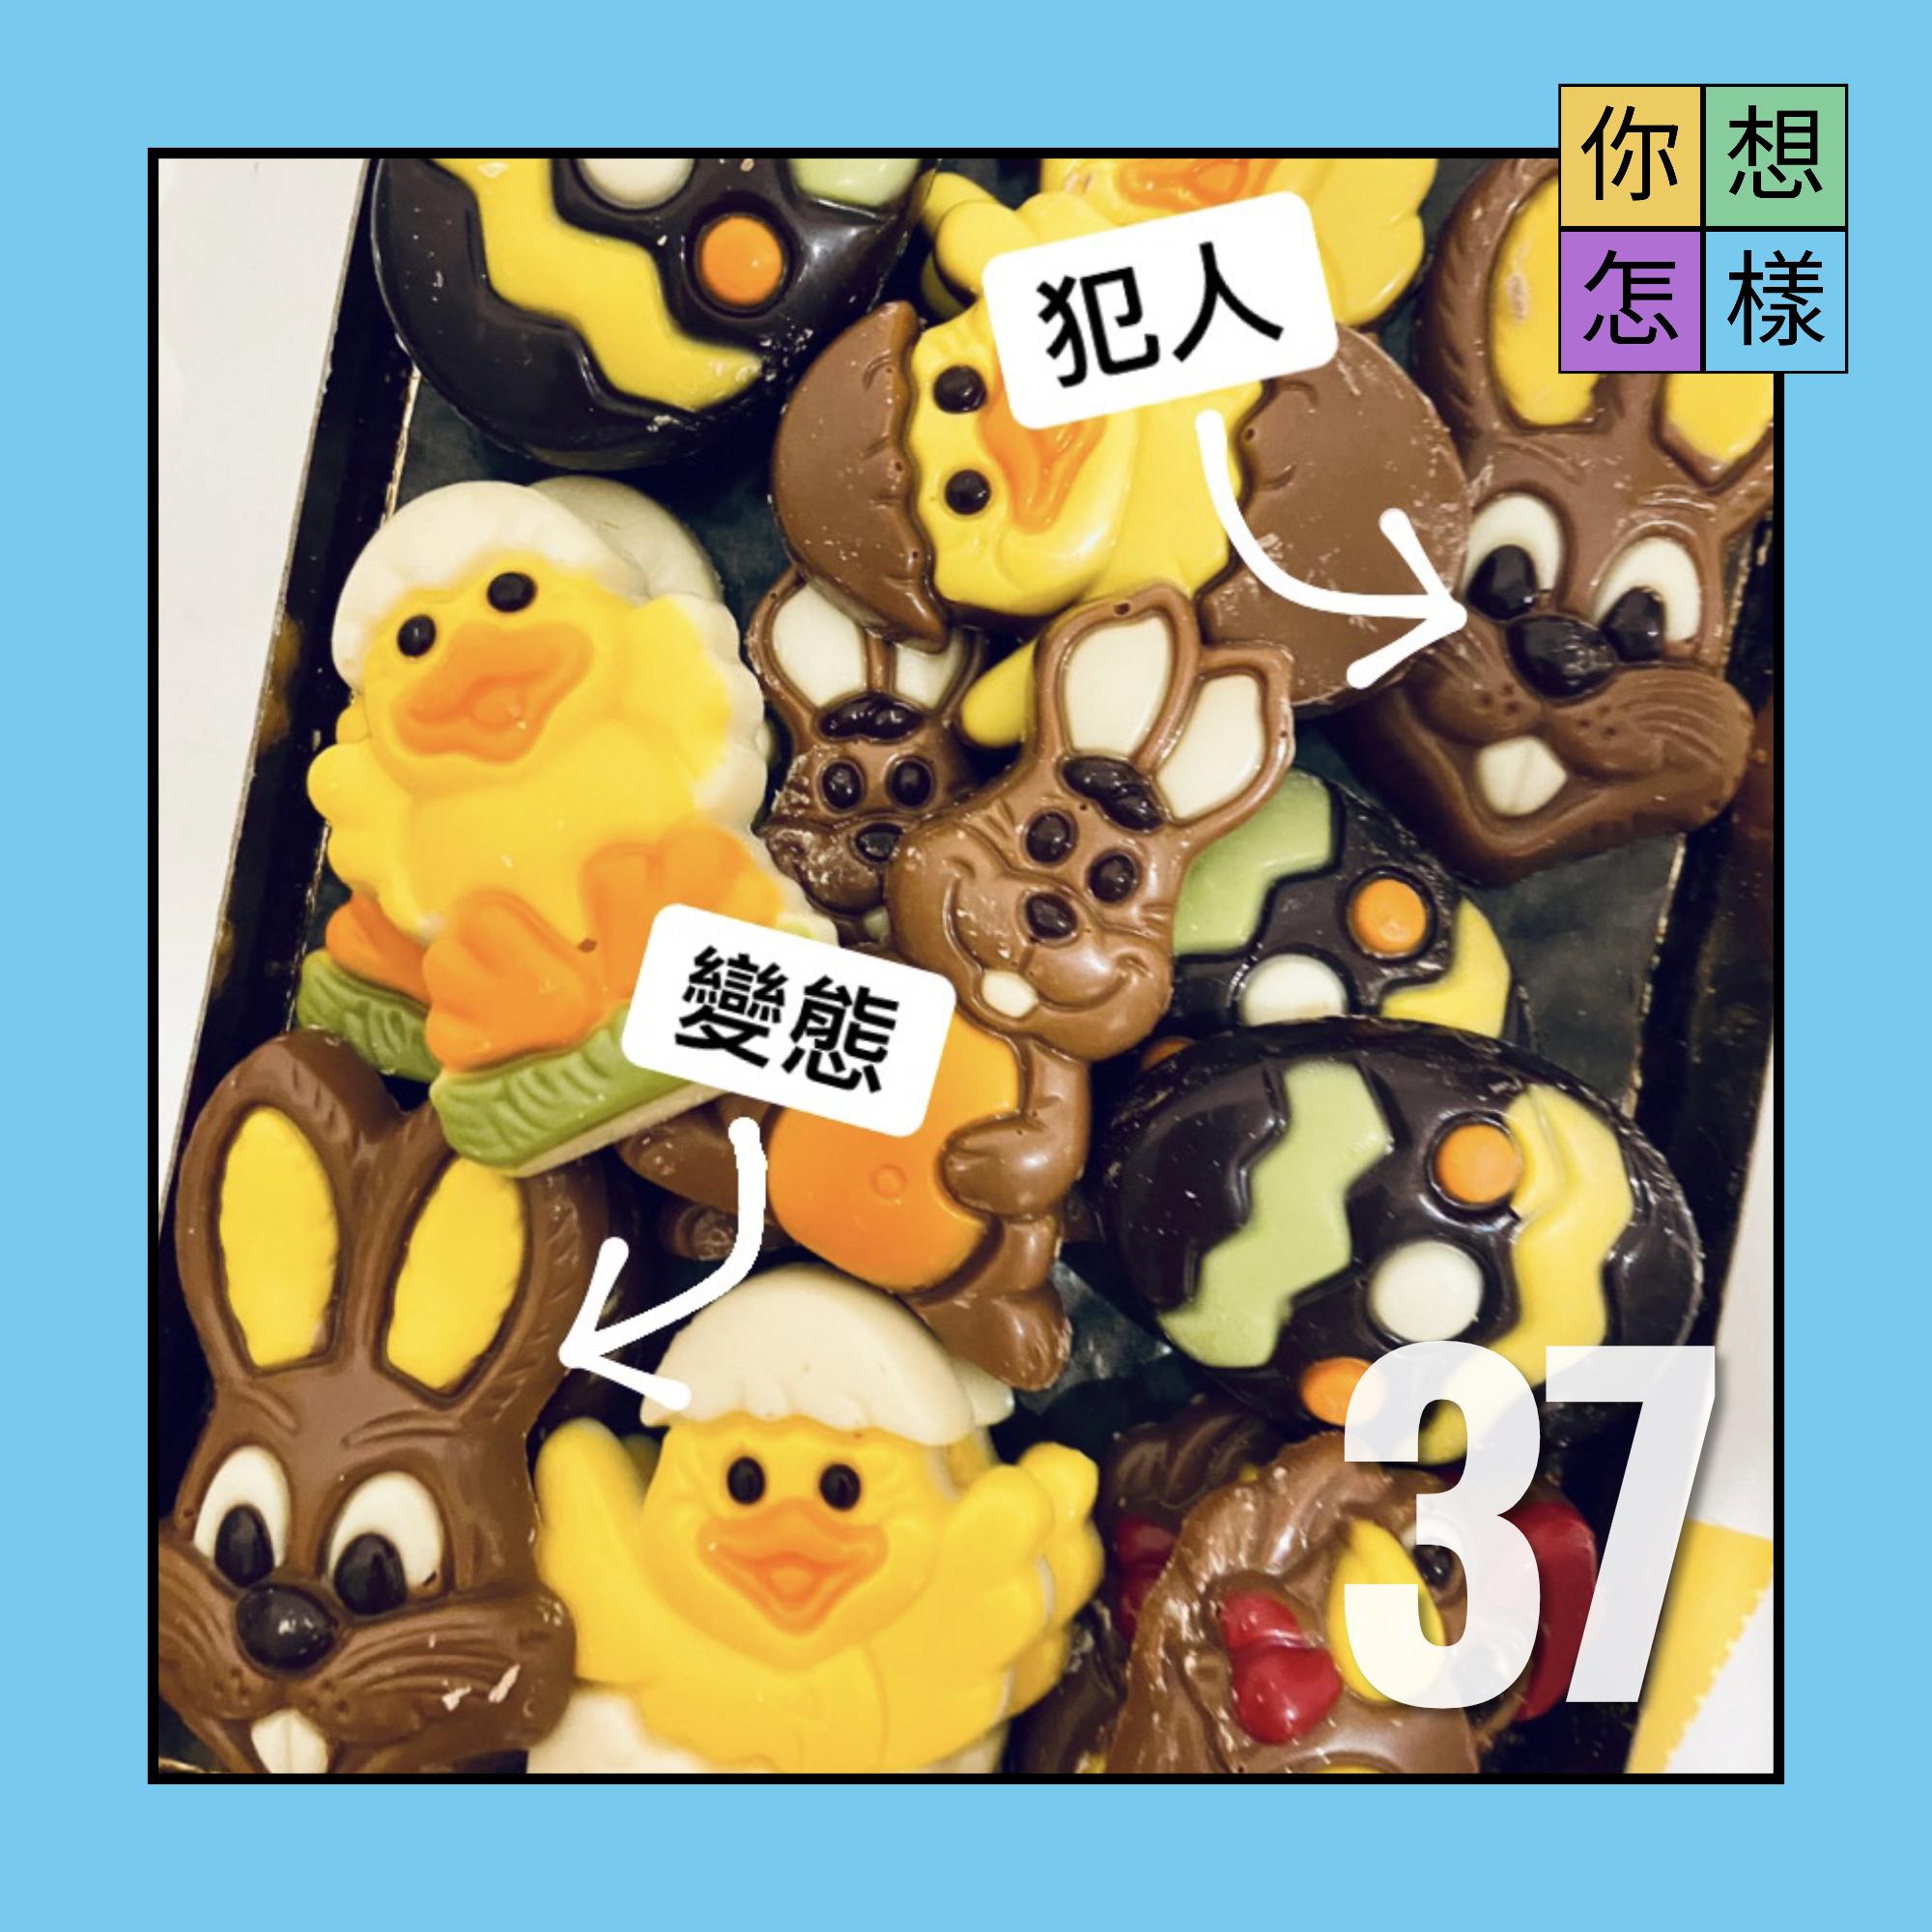 Episode 37 - 變態兔兔與小禮物&職場上的黑洞現象!?